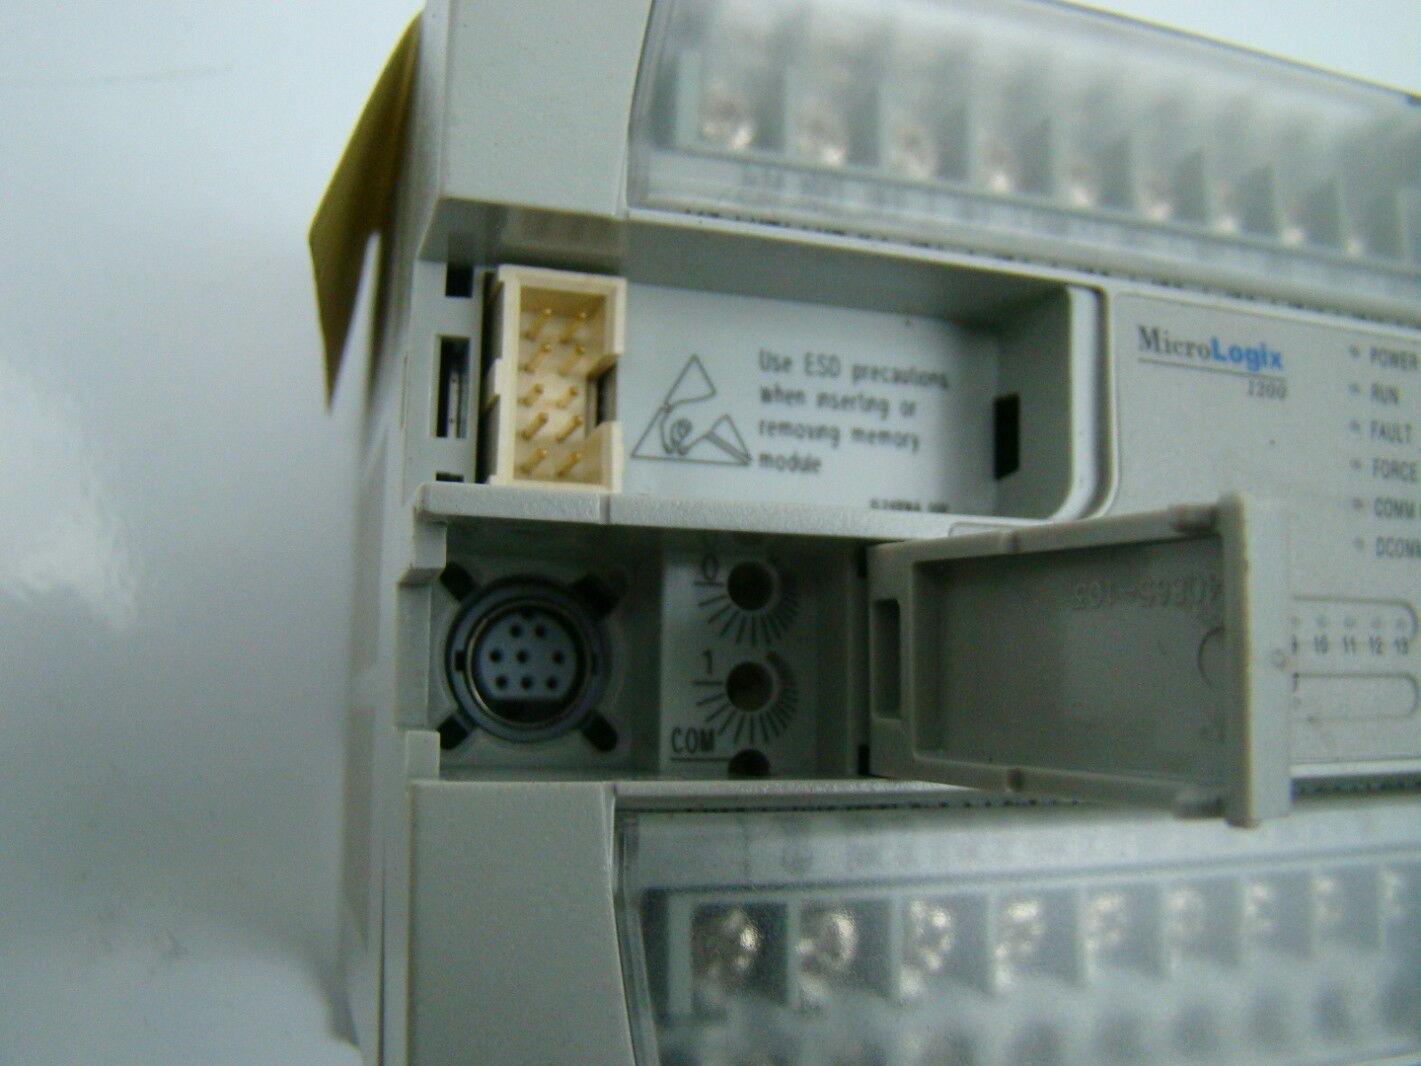 jf04712 allen bradley 24 volt micrologix controller 1200 1762 l24bwa 7 micrologix controller dolgular com 1762-l24bwa wiring diagram at edmiracle.co